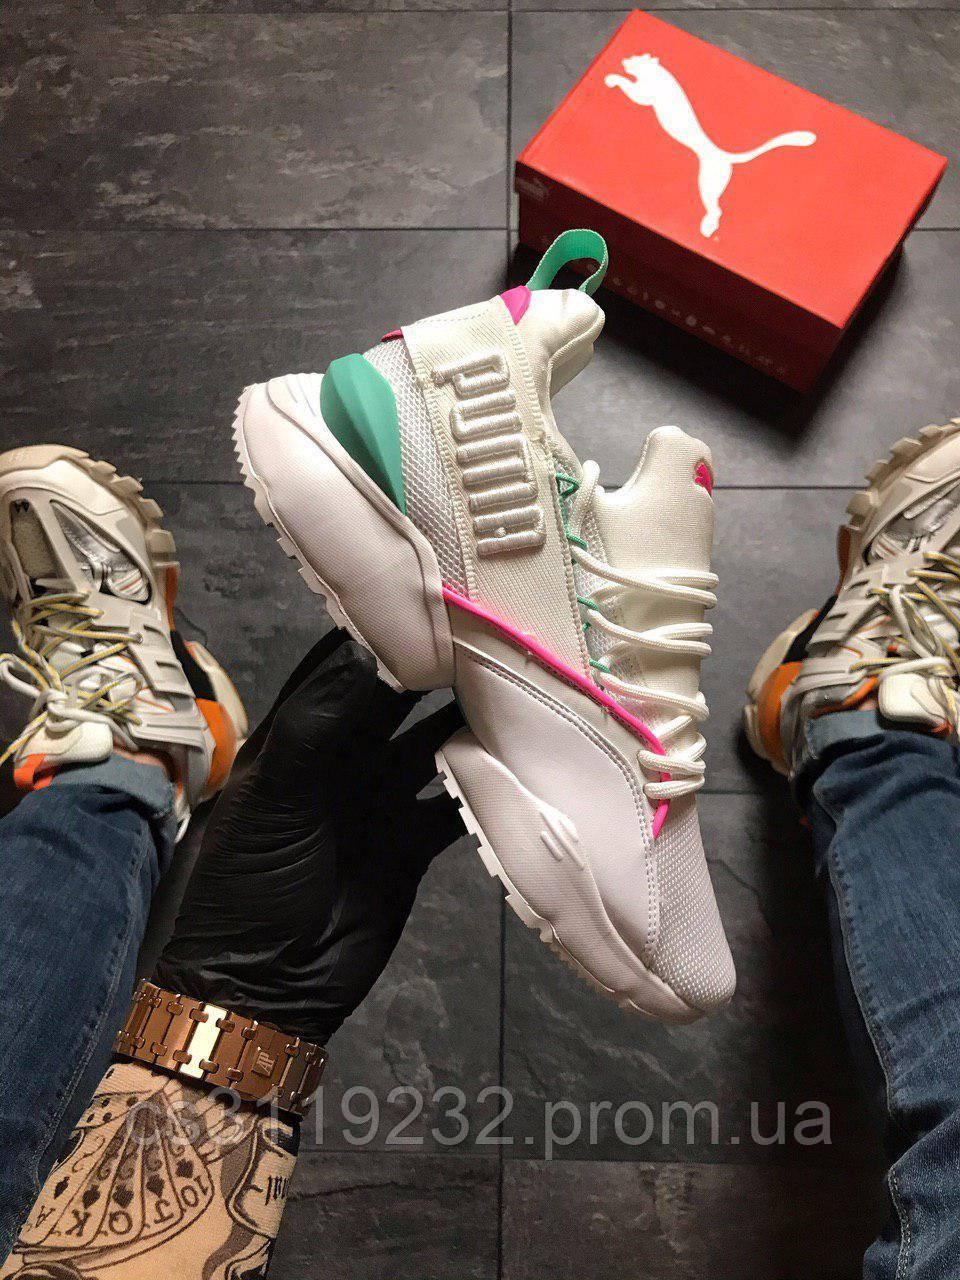 Жіночі кросівки Puma Shantell Martin Muse White with green (білий)